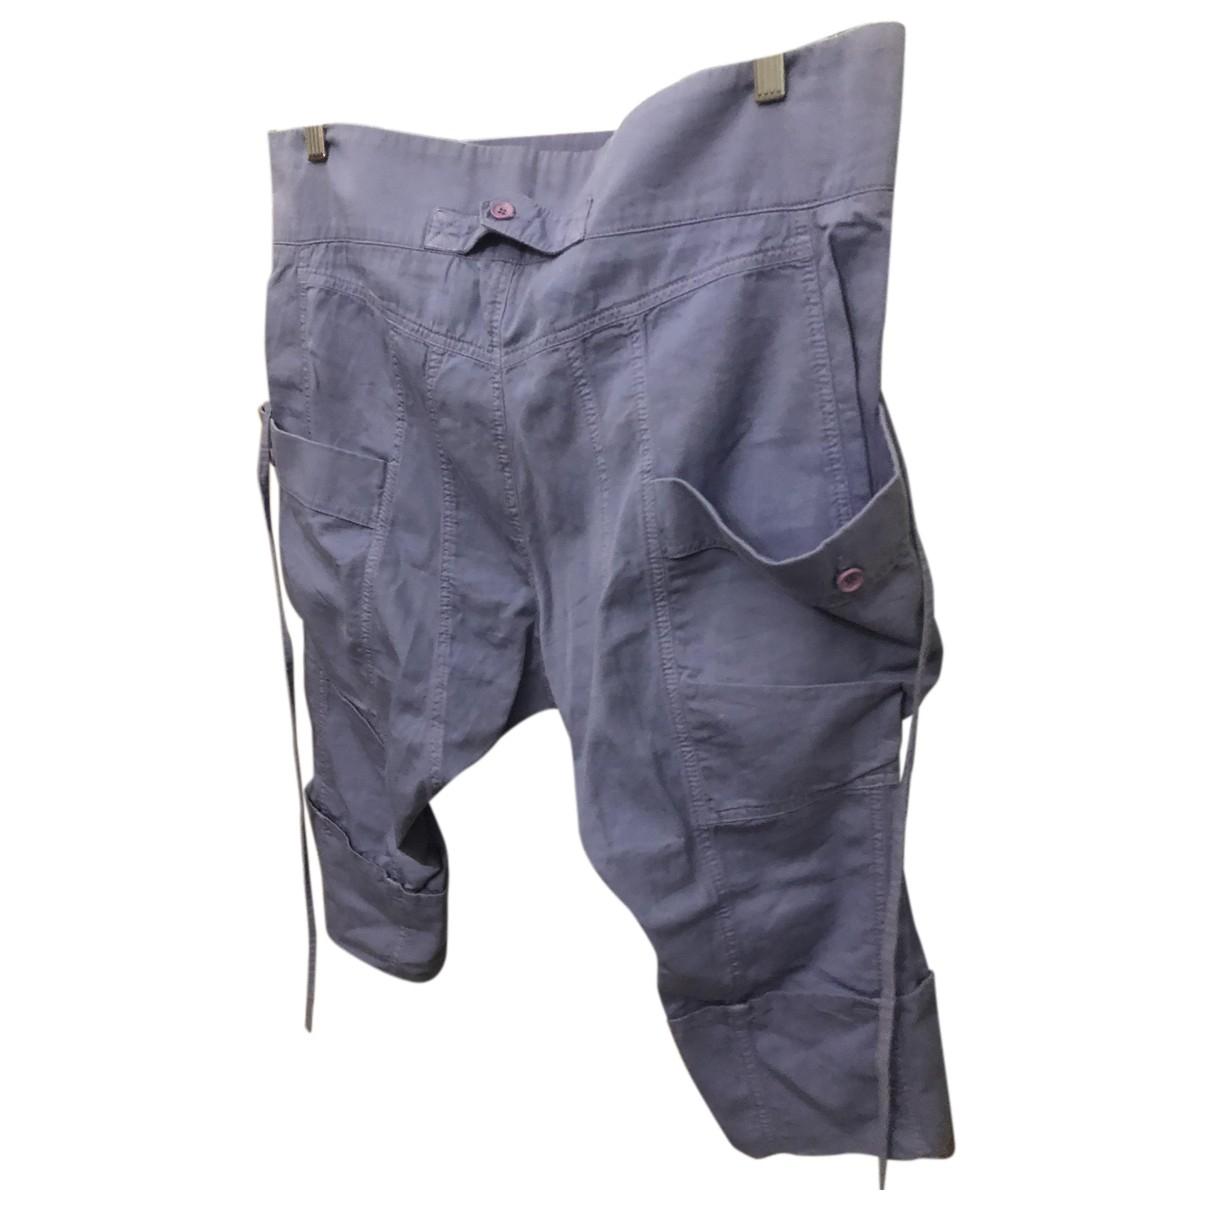 D&g \N Shorts in  Lila Baumwolle